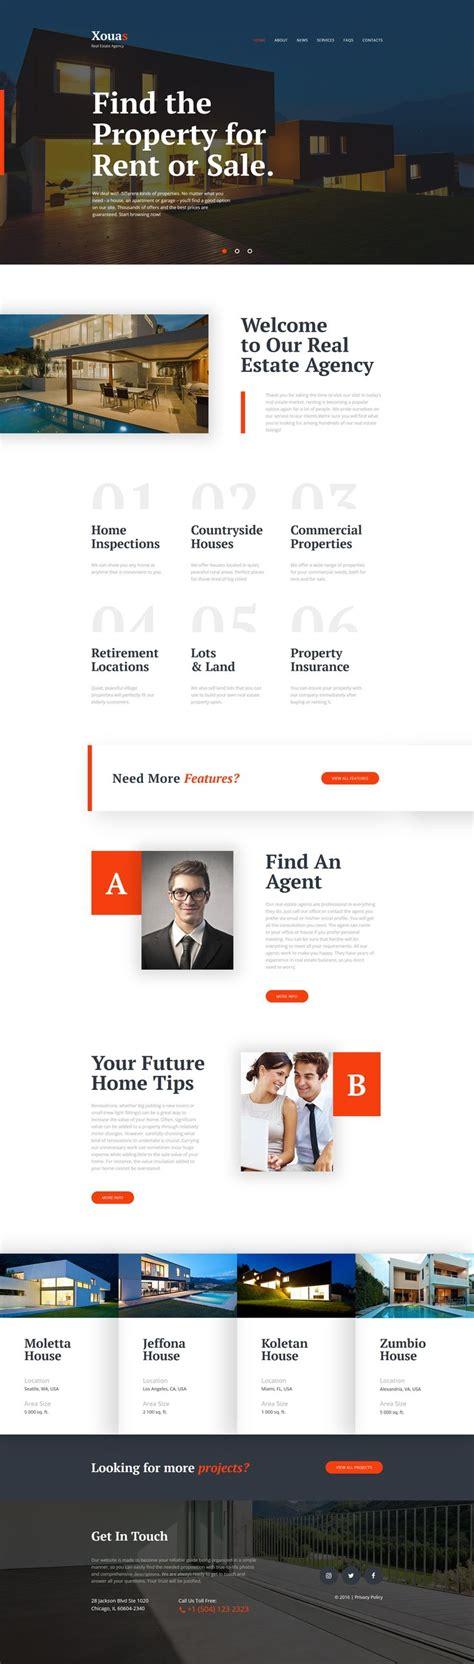 Best 25 Website Template Ideas On Pinterest Html Website Templates Fashion Web Design And Real Estate Development Website Templates